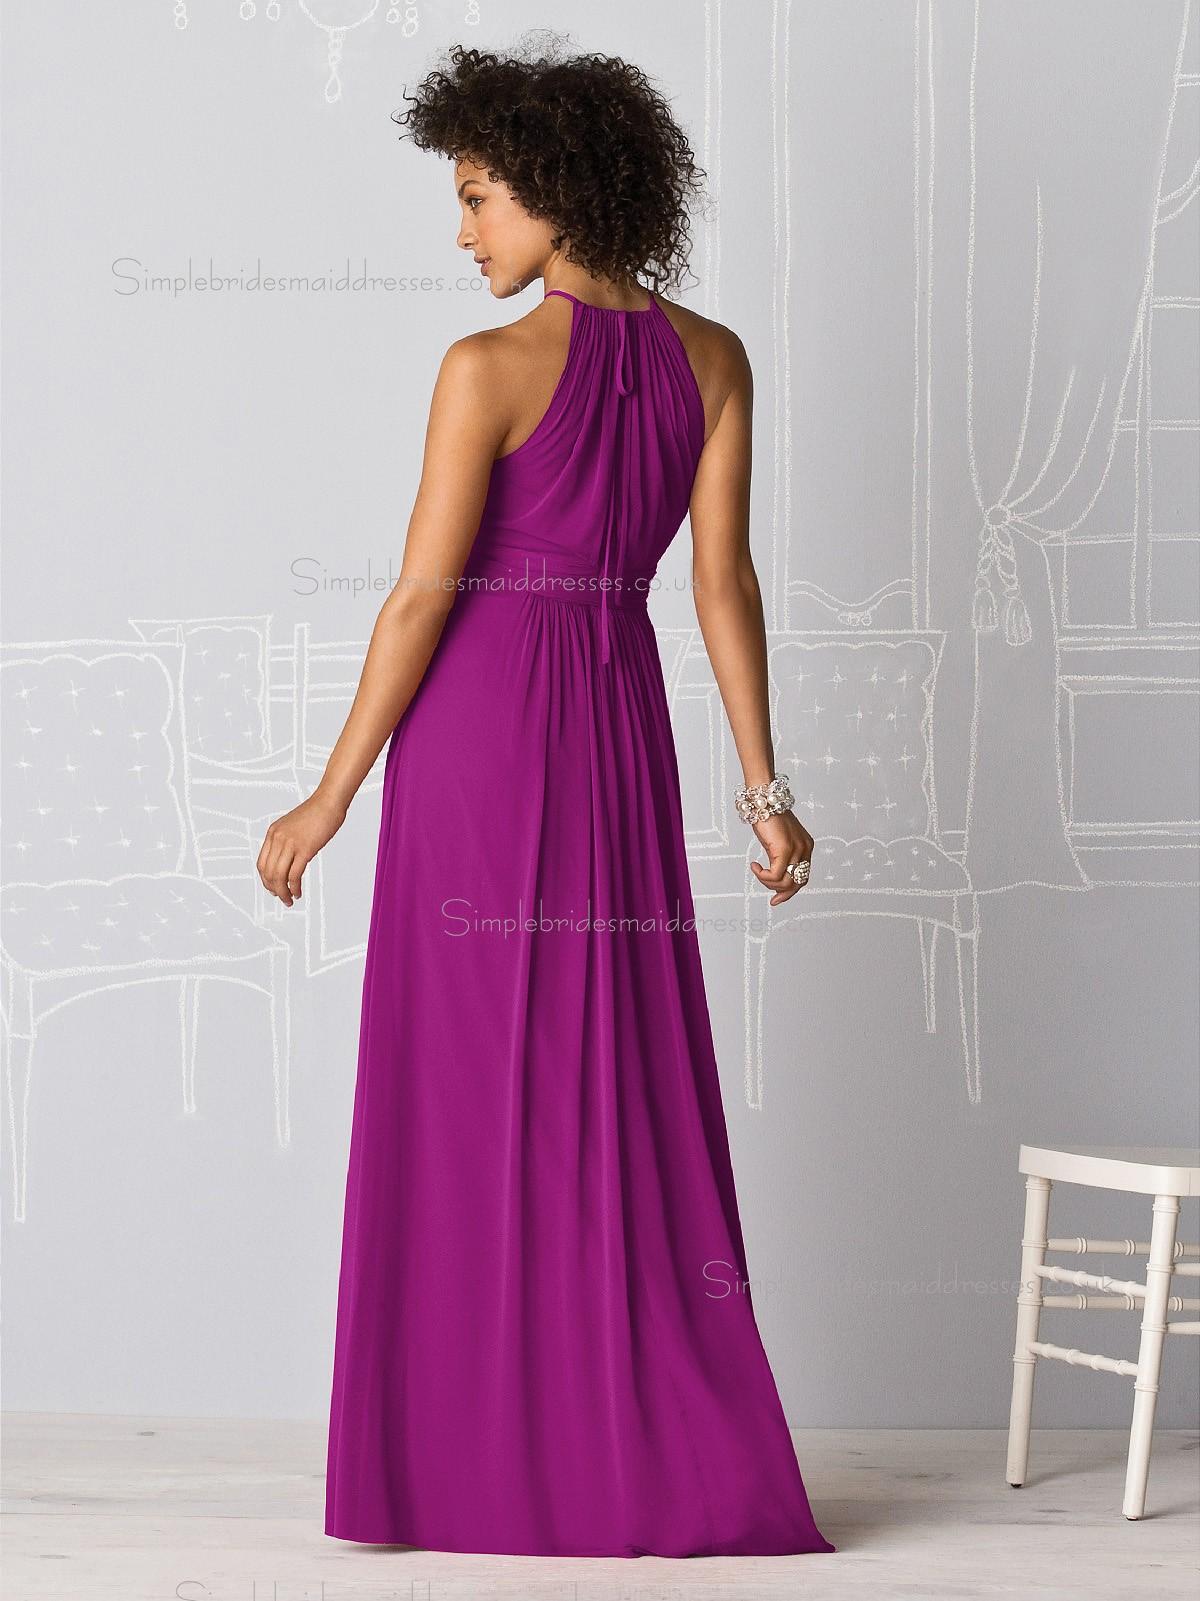 Luxury Stylish Persian Plum Floor Length Bridesmaid